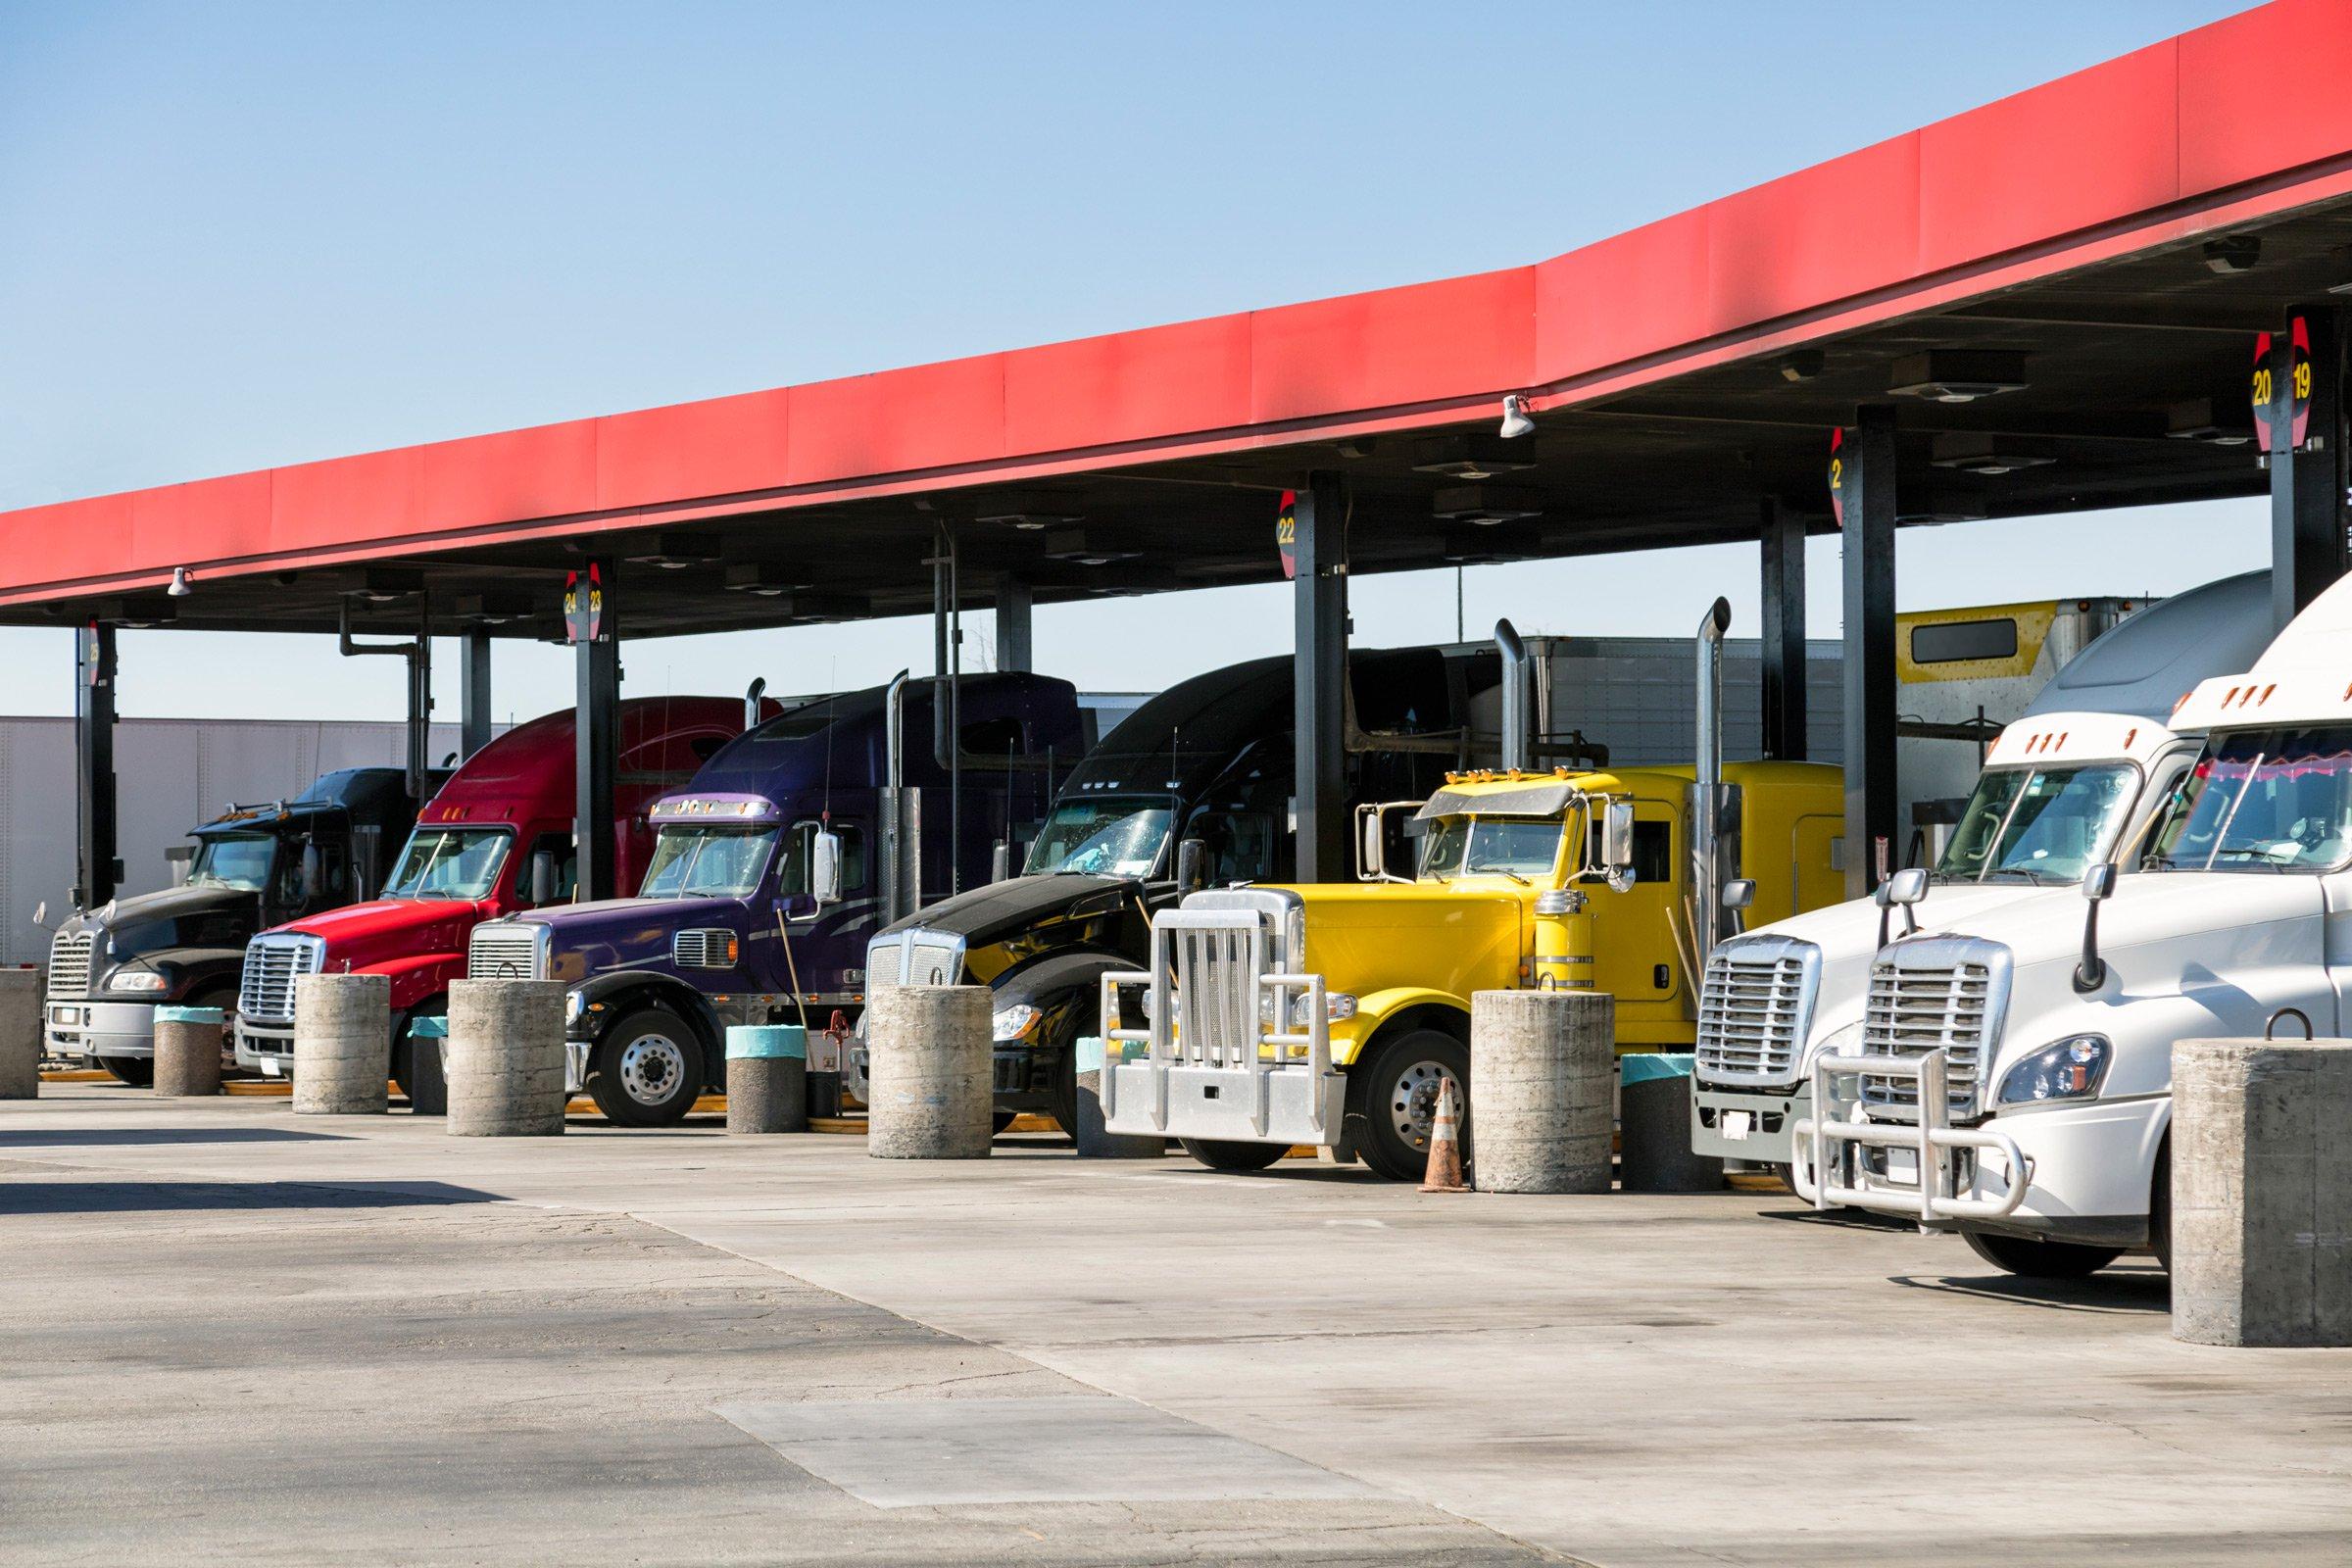 Trucks filling up at truck stop